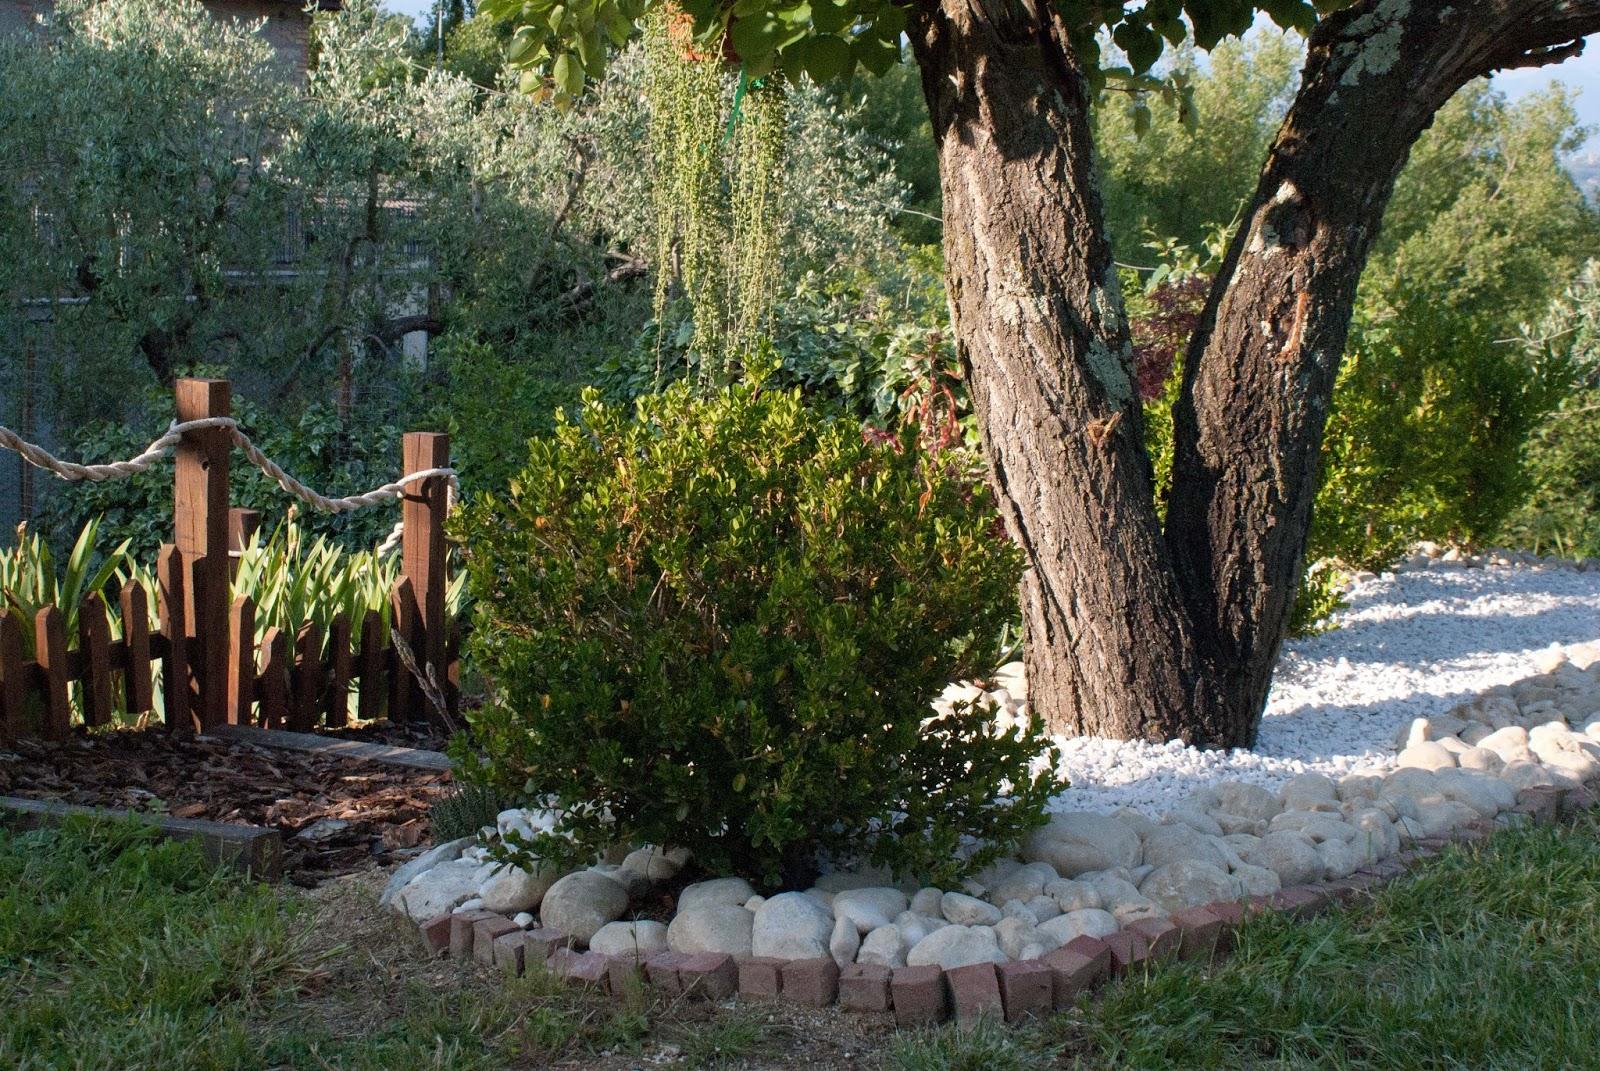 Sassi bianchi giardino bricoman ciottoli da giardino for Sassi da giardino obi